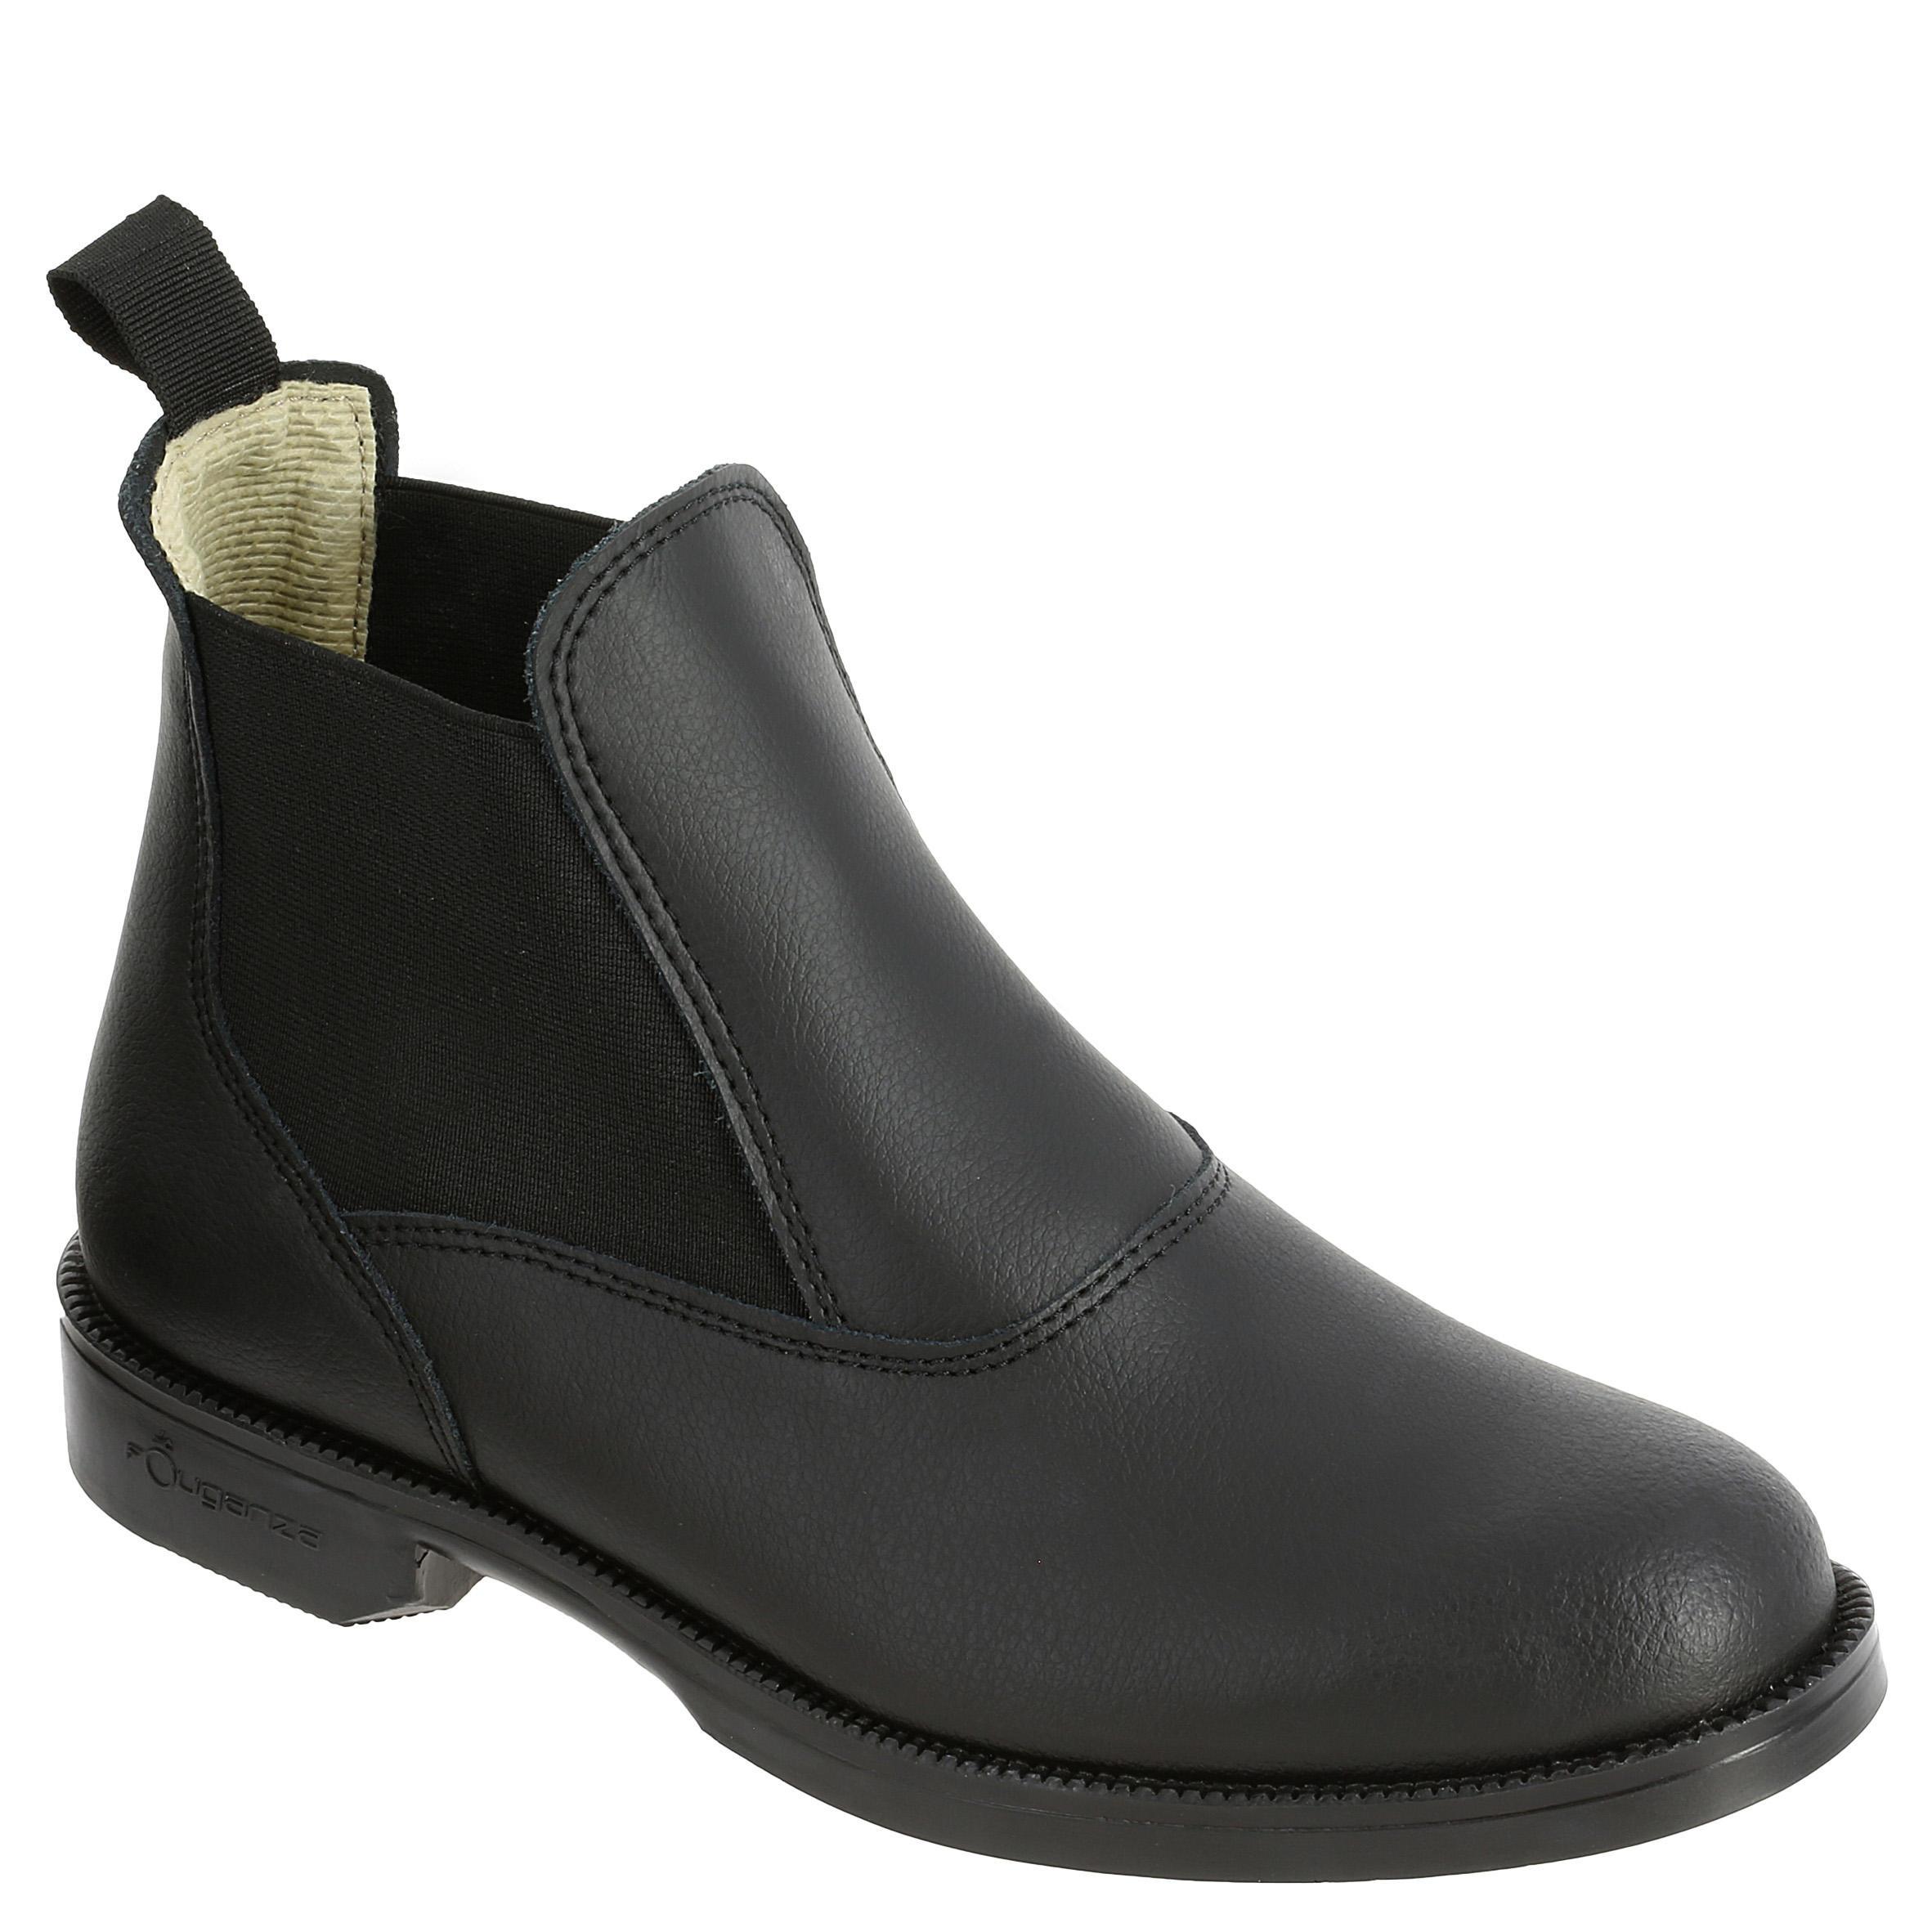 FOUGANZA Boots équitation adulte CLASSIC cuir noir - FOUGANZA - 35